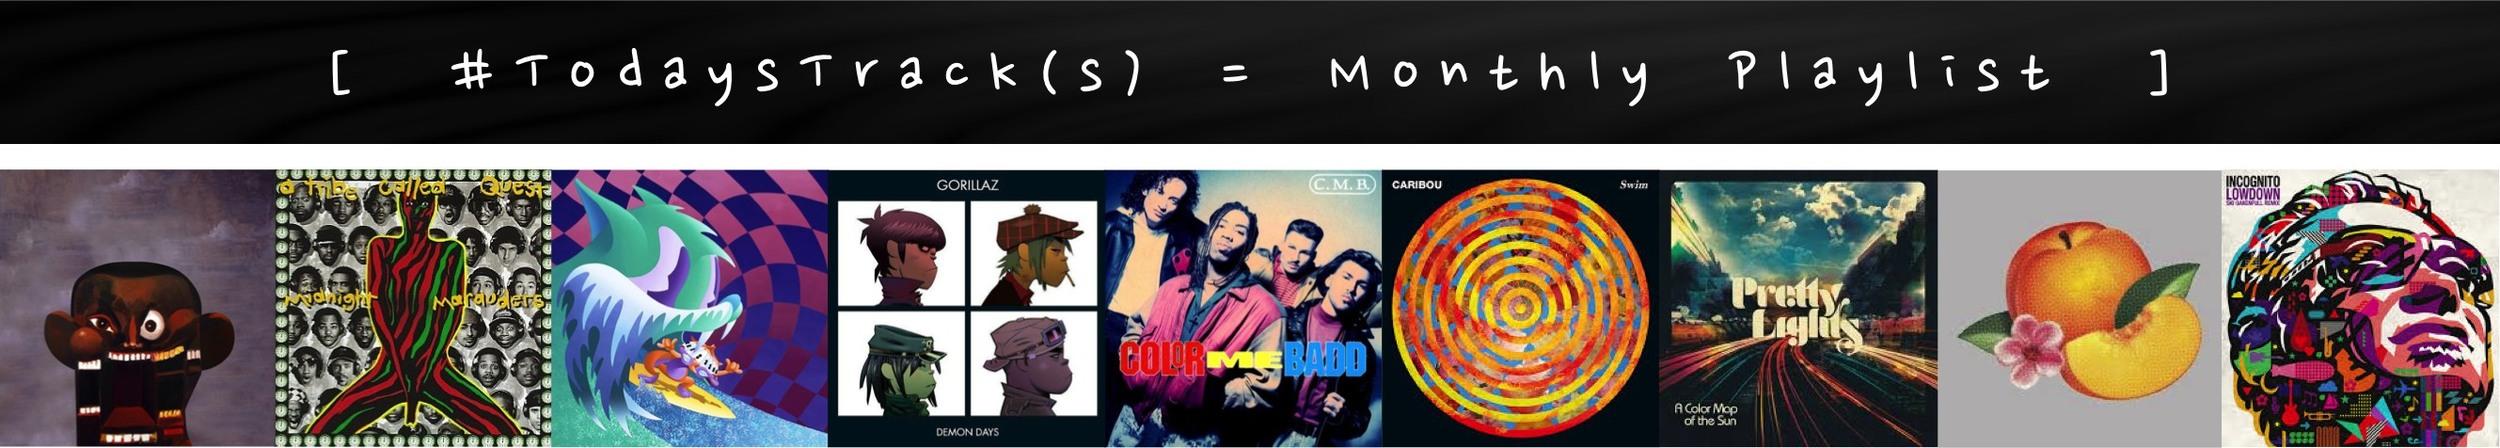 NeverRadio October Playlist todaystrack